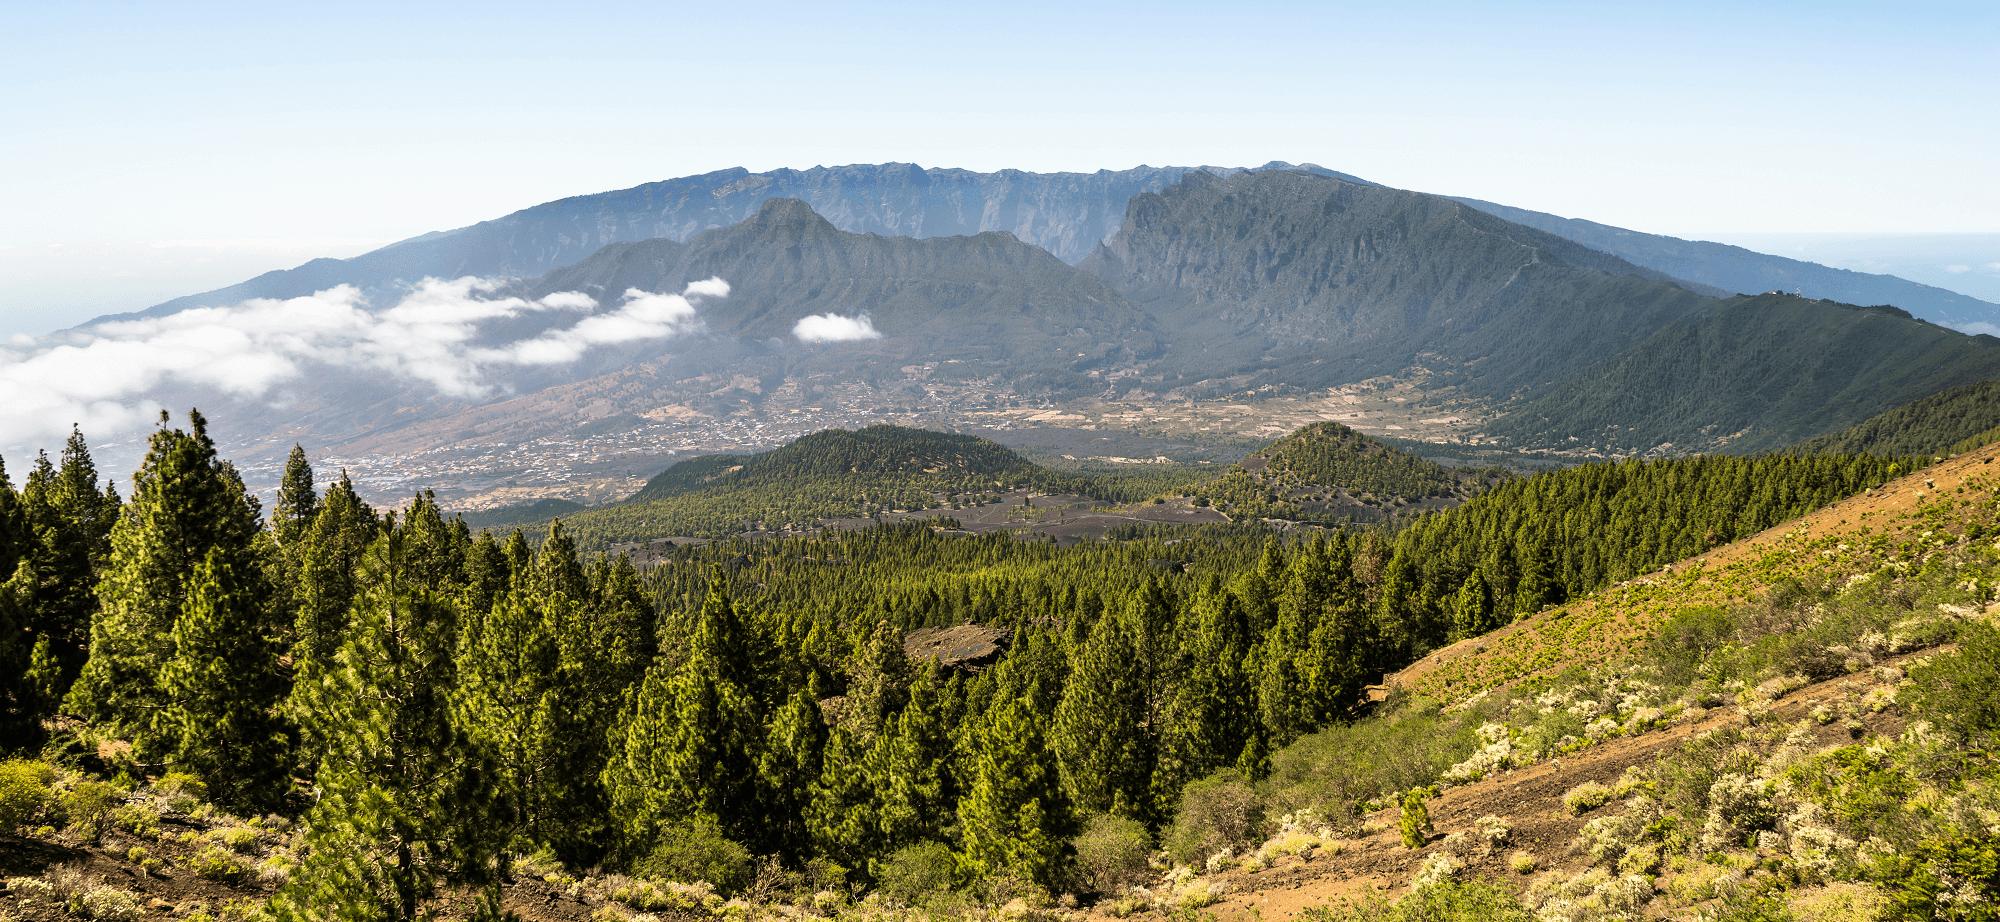 Hiking La Palma Caldera de Taburiente national park